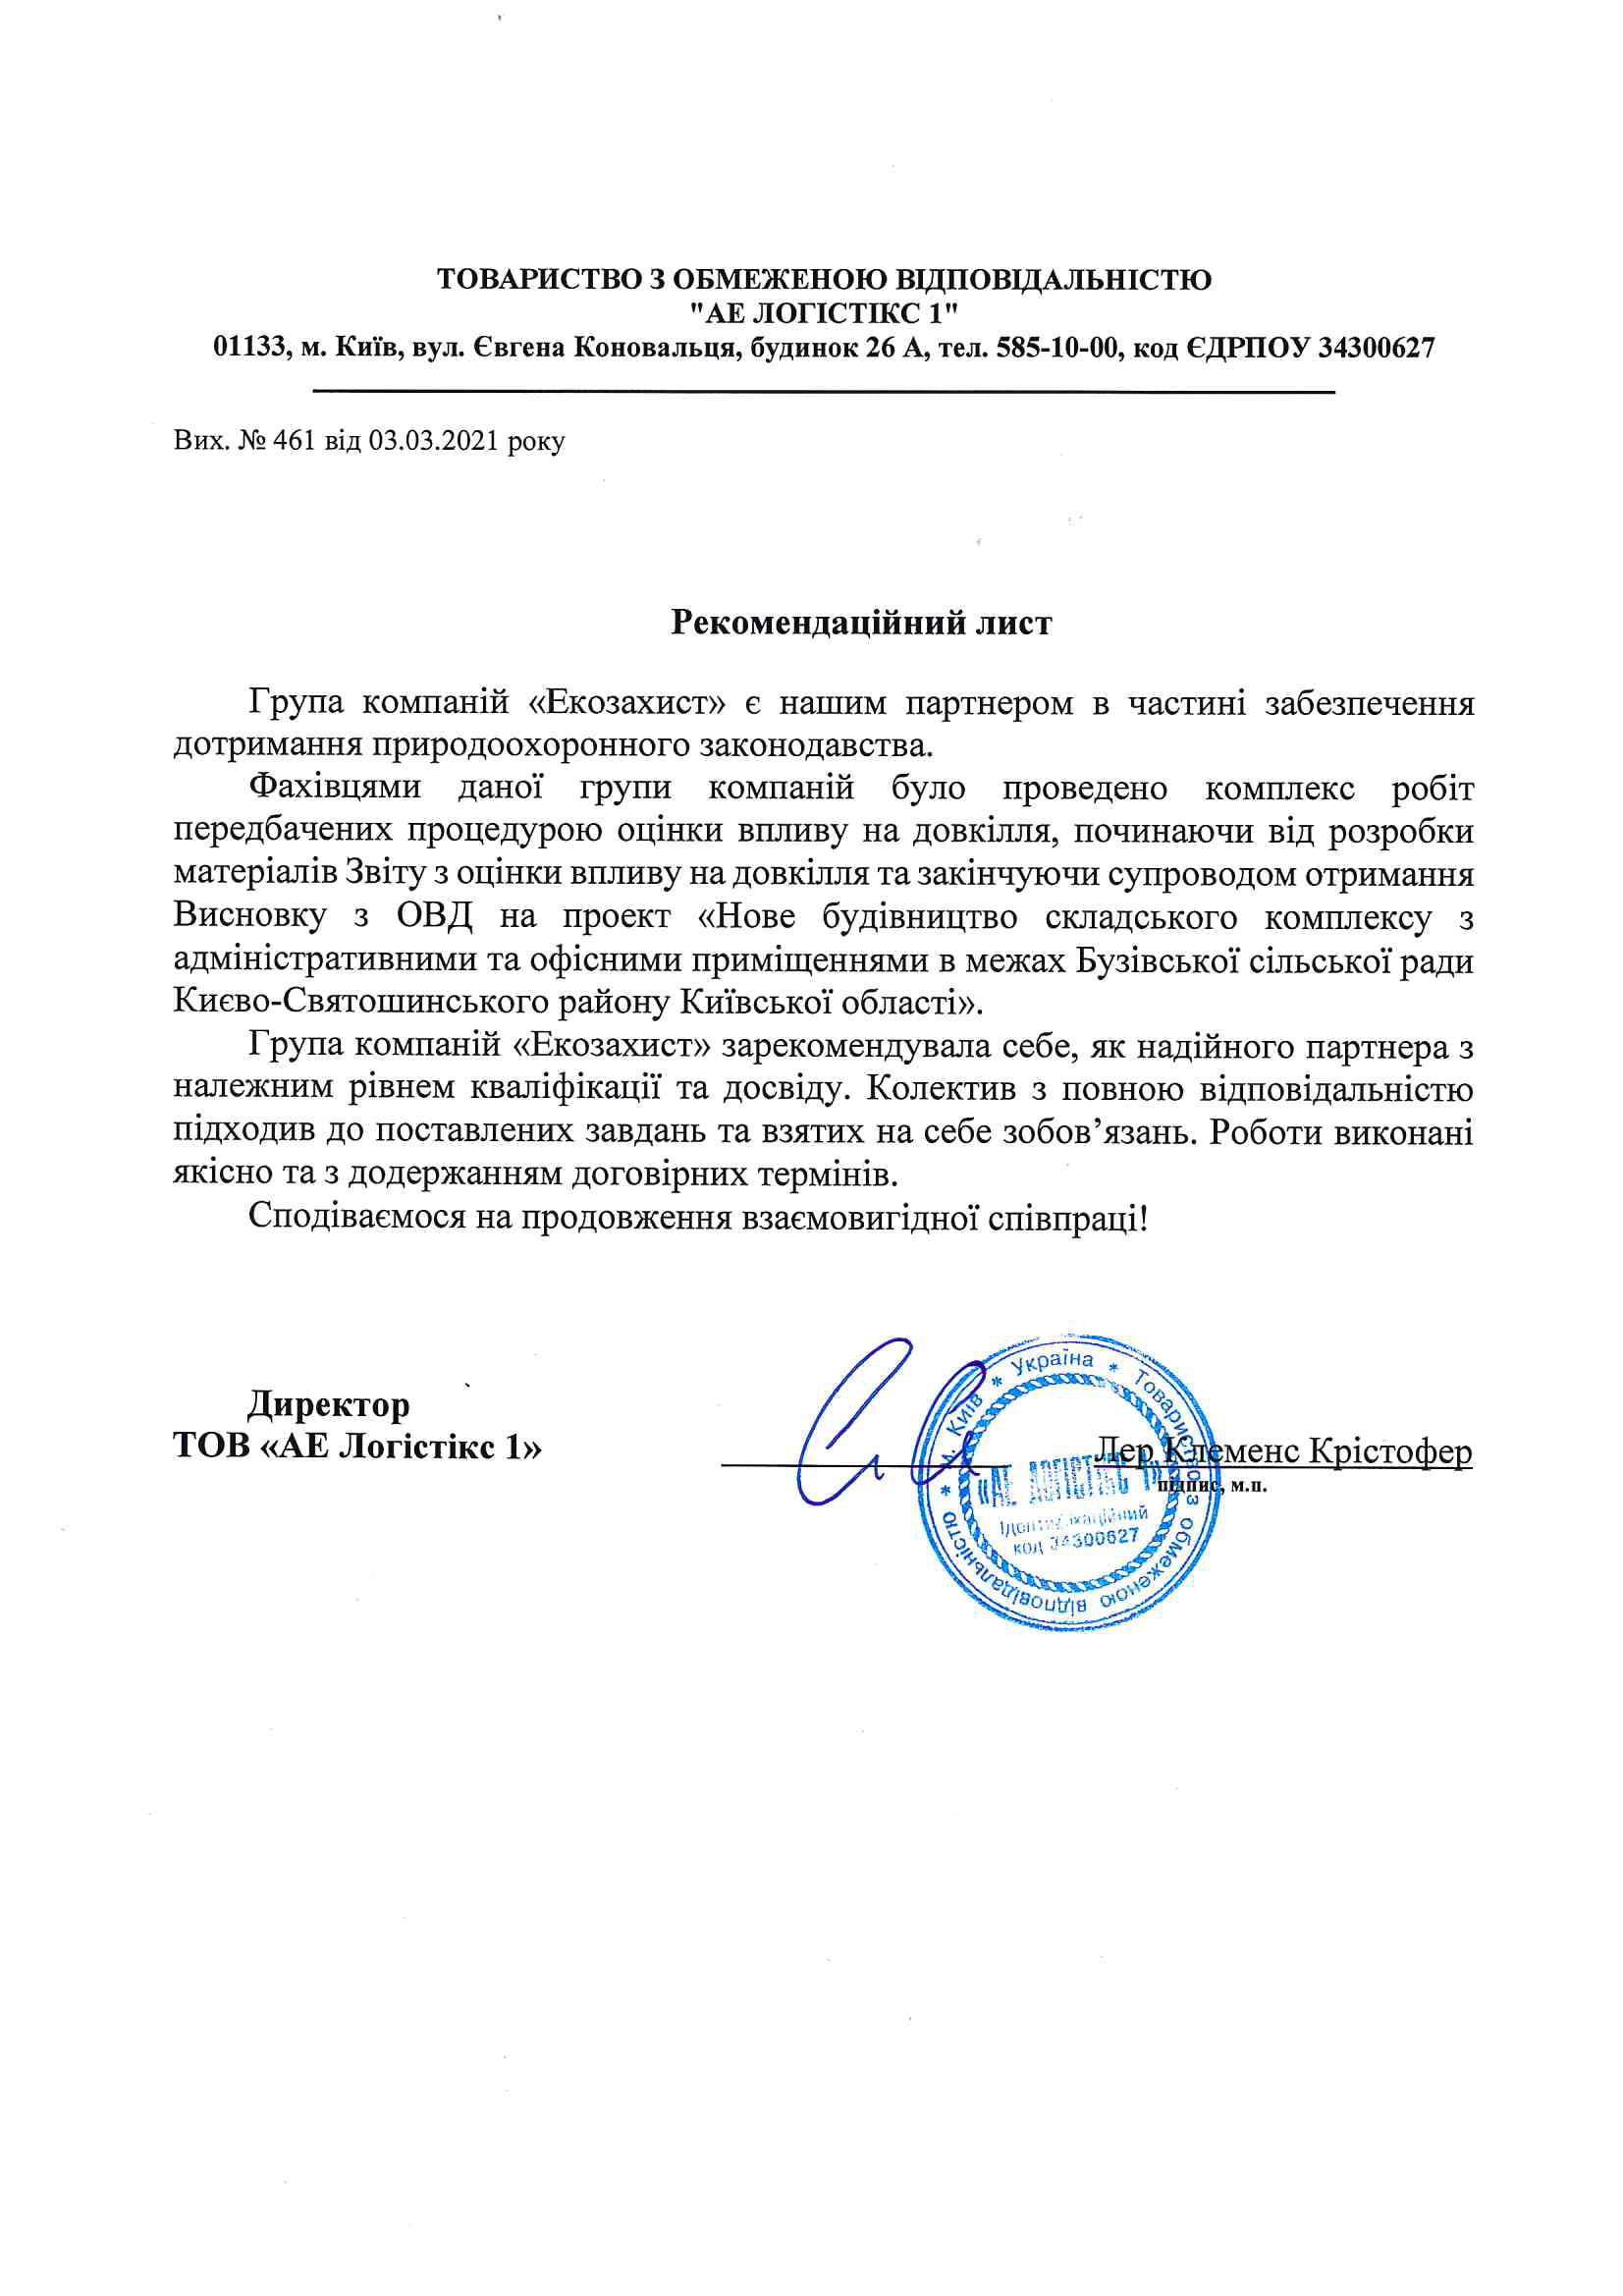 "Директор ООО ""АЕ Логистикс 1"" – Лер Клеменс Кристофер"